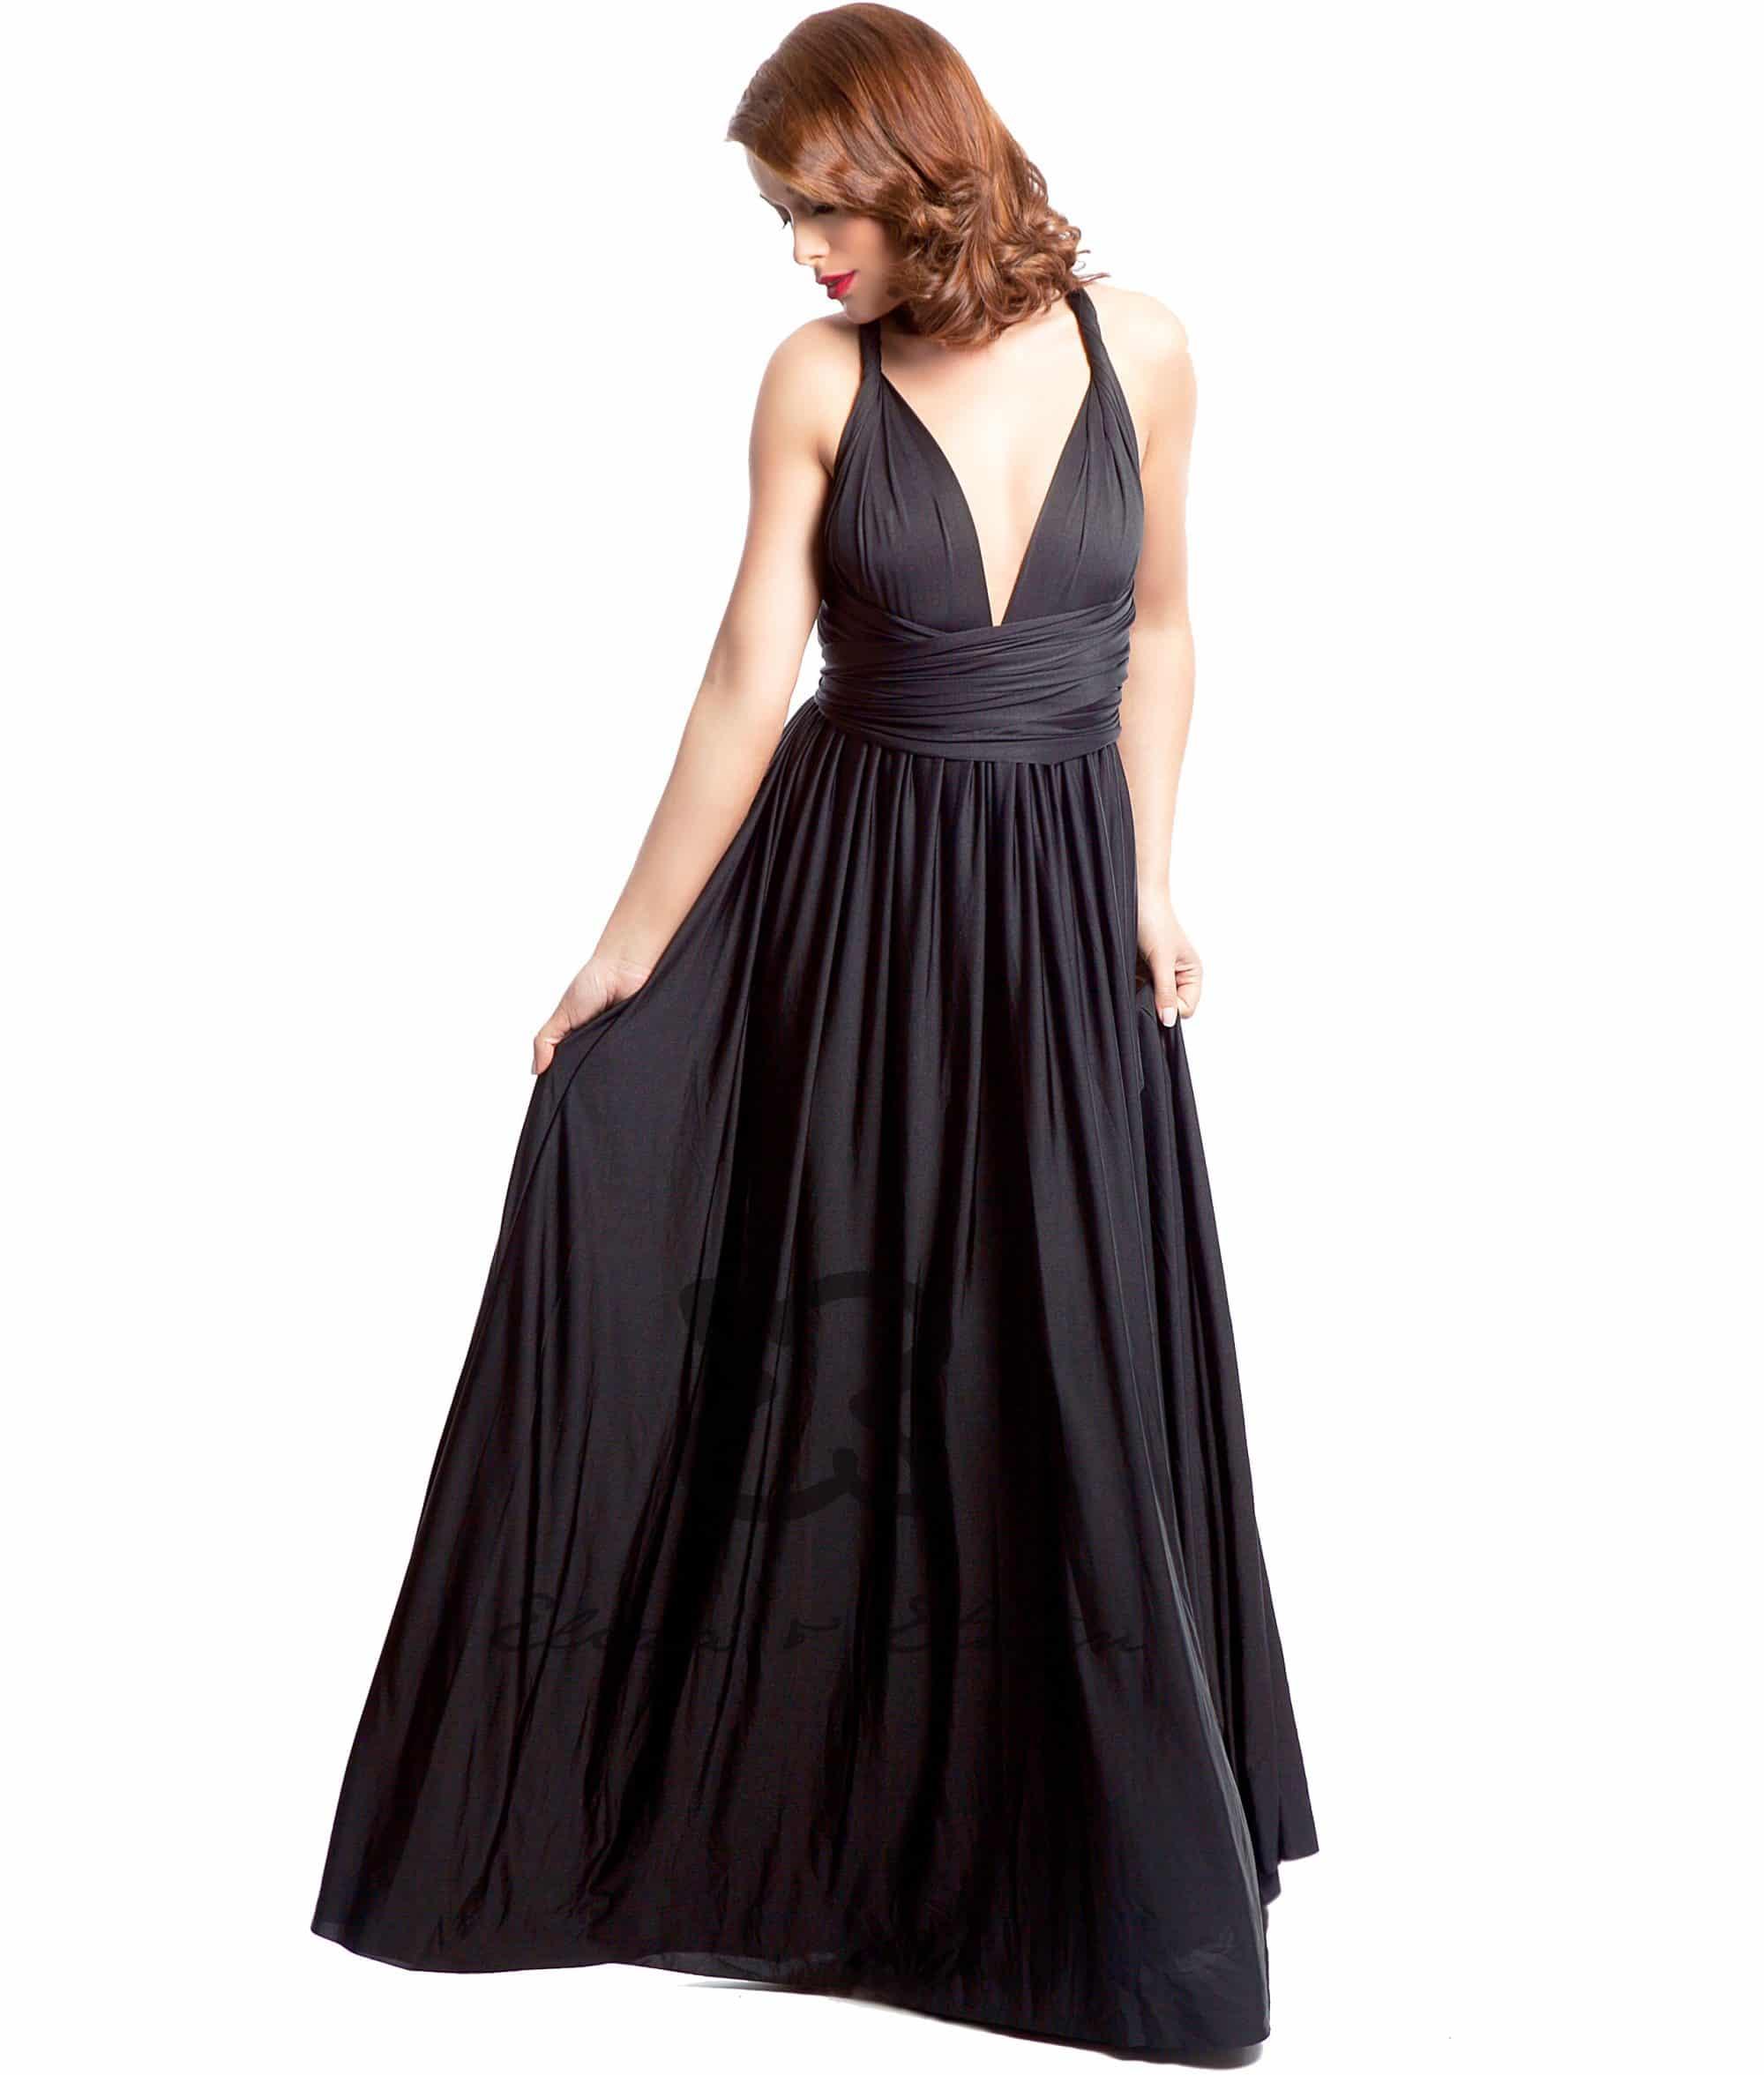 Eliza and Ethan Onyx Black Multiway Dress Alila